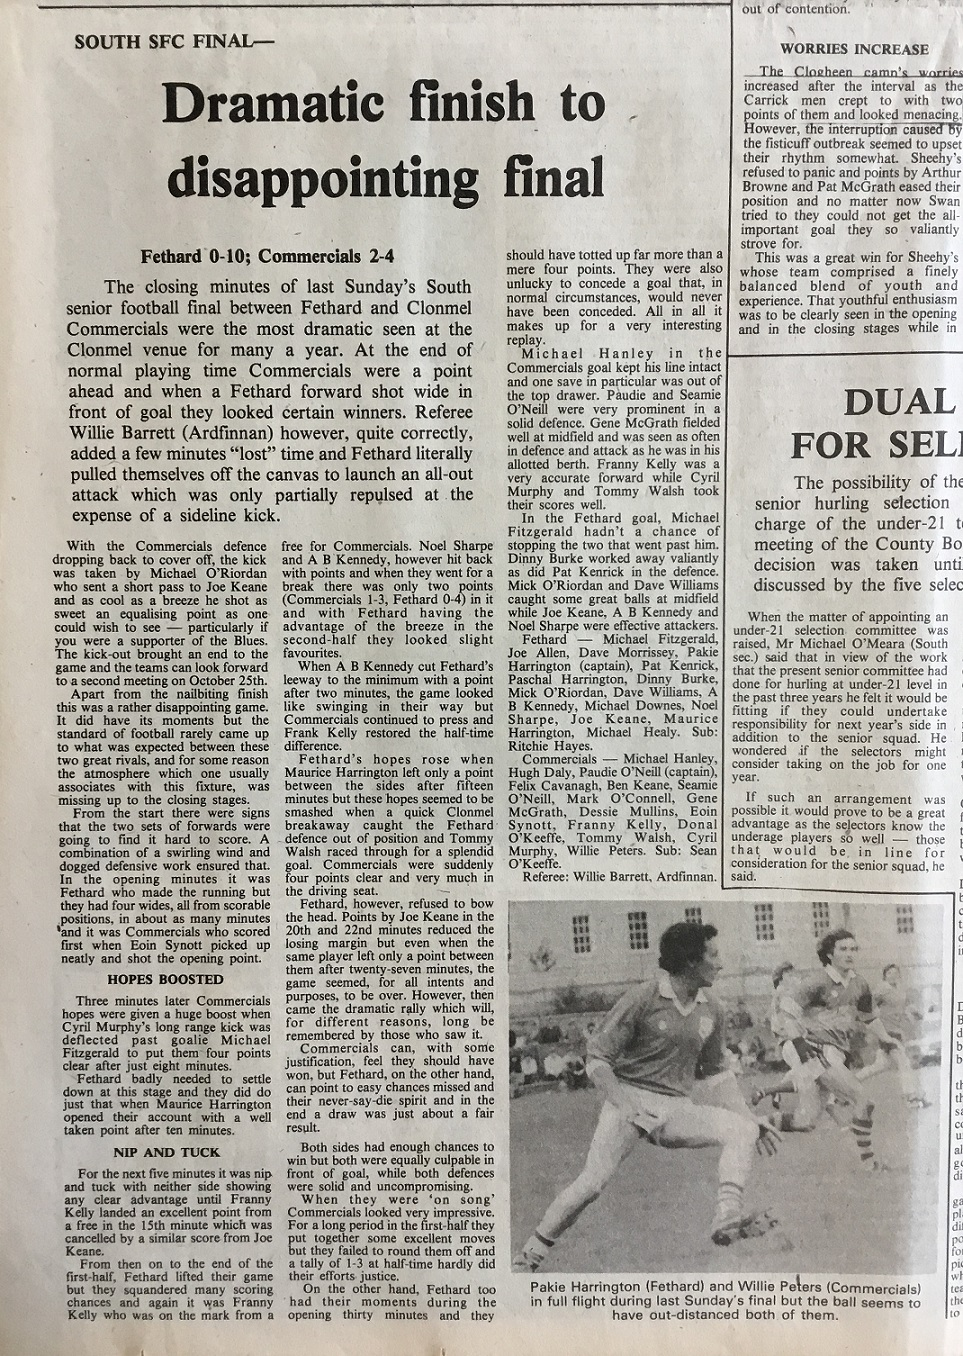 1981 South football final (2)